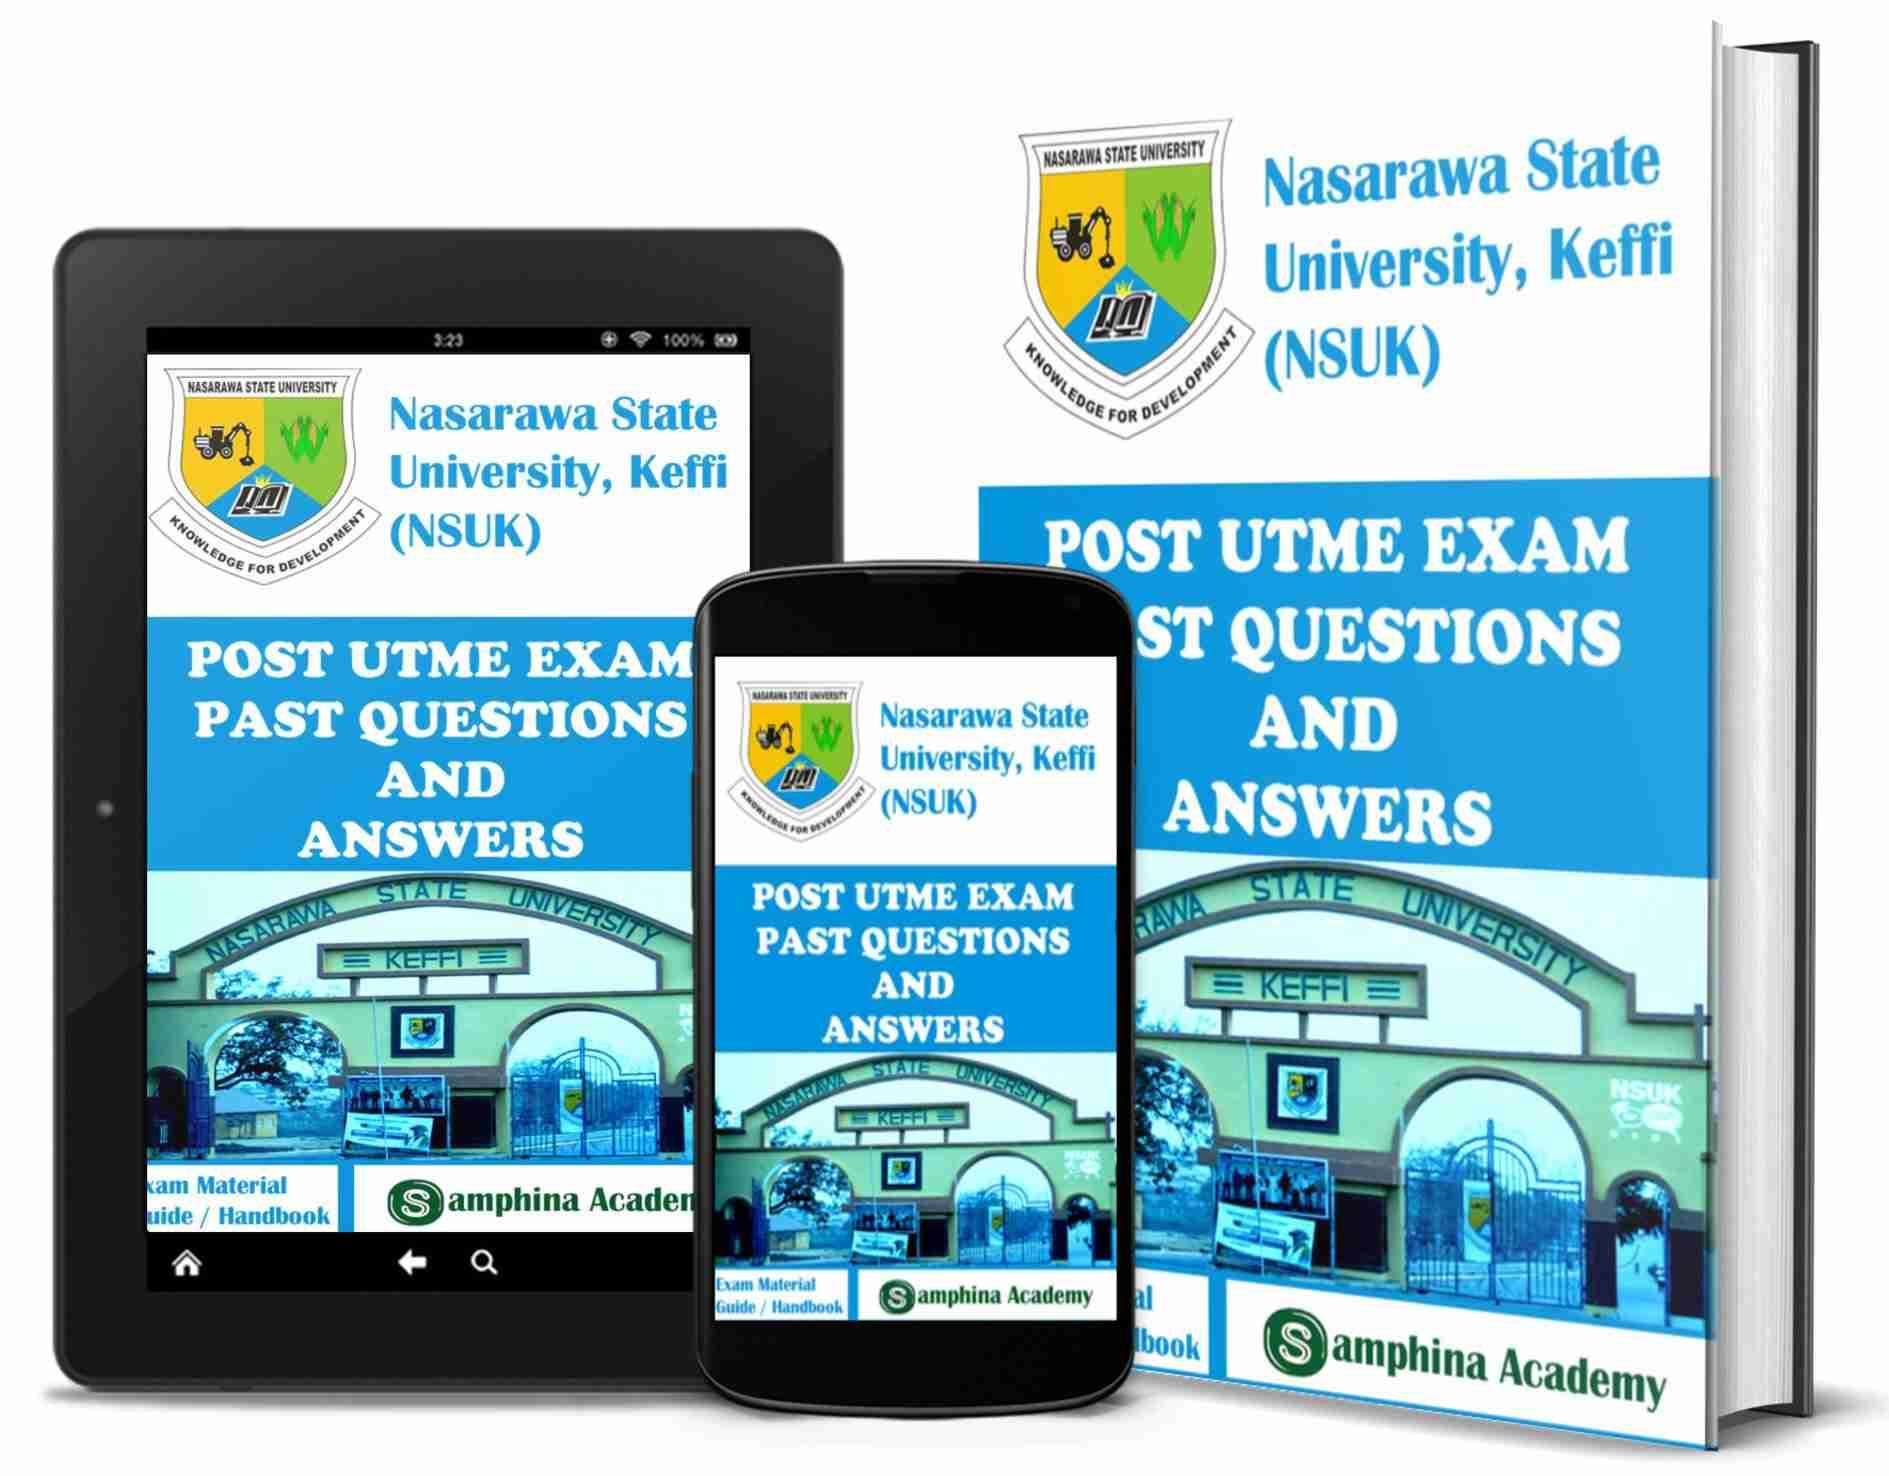 NSUK - Nasarawa State University, Keffi Post UTME Screening Examination Past Questions and Answers